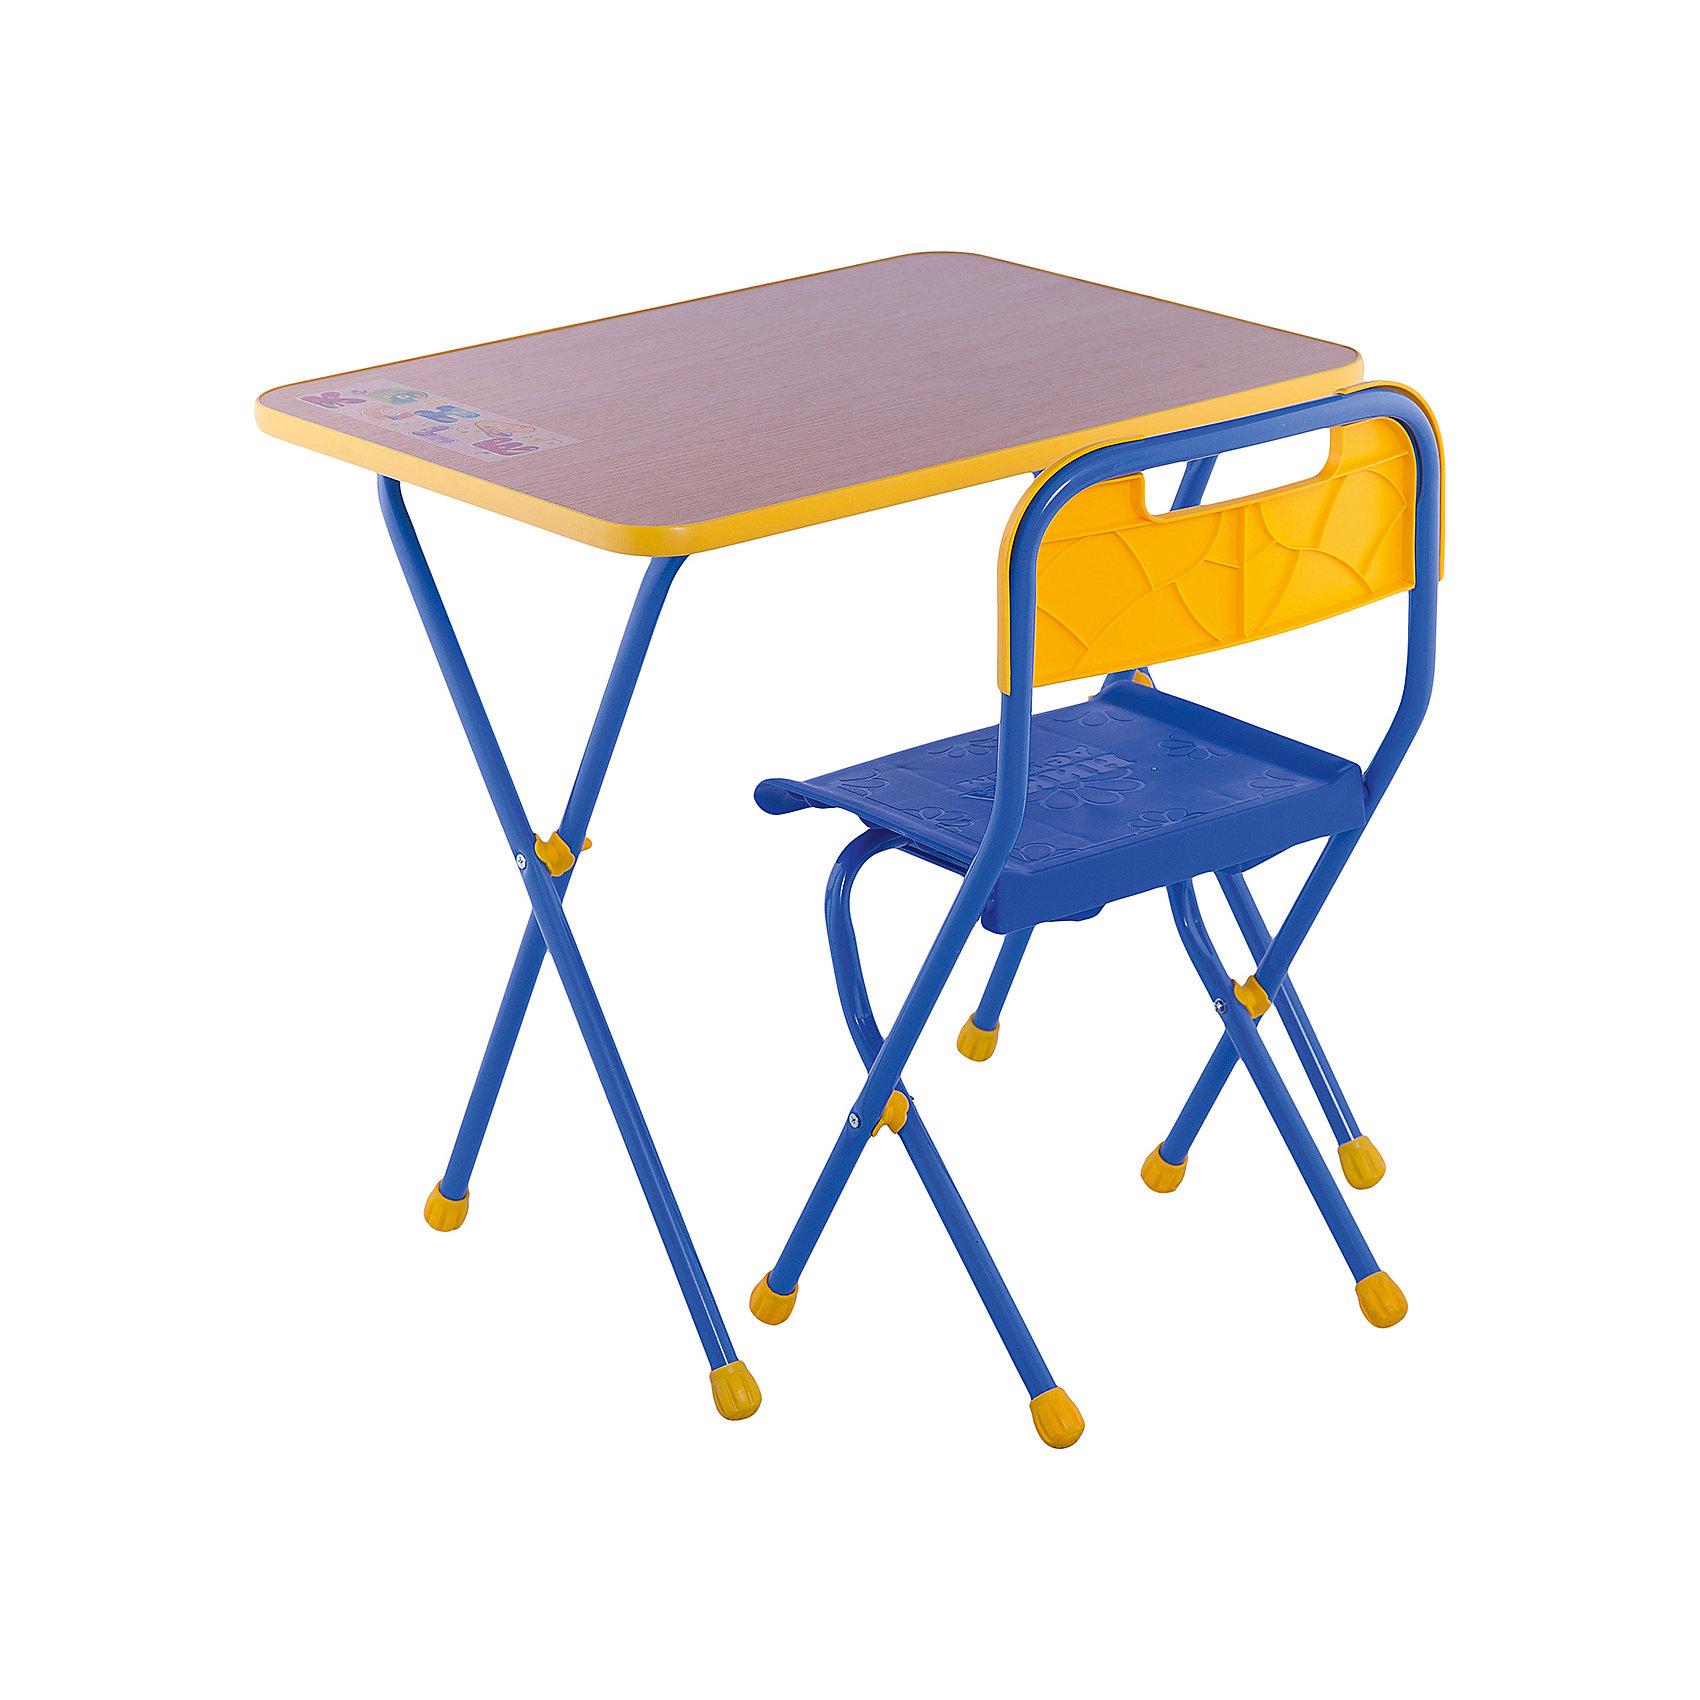 Ника Набор мебели КА1, Алина, Ника, бук регулируемое расширение стола до 600 мм twx7ss triton tr267729